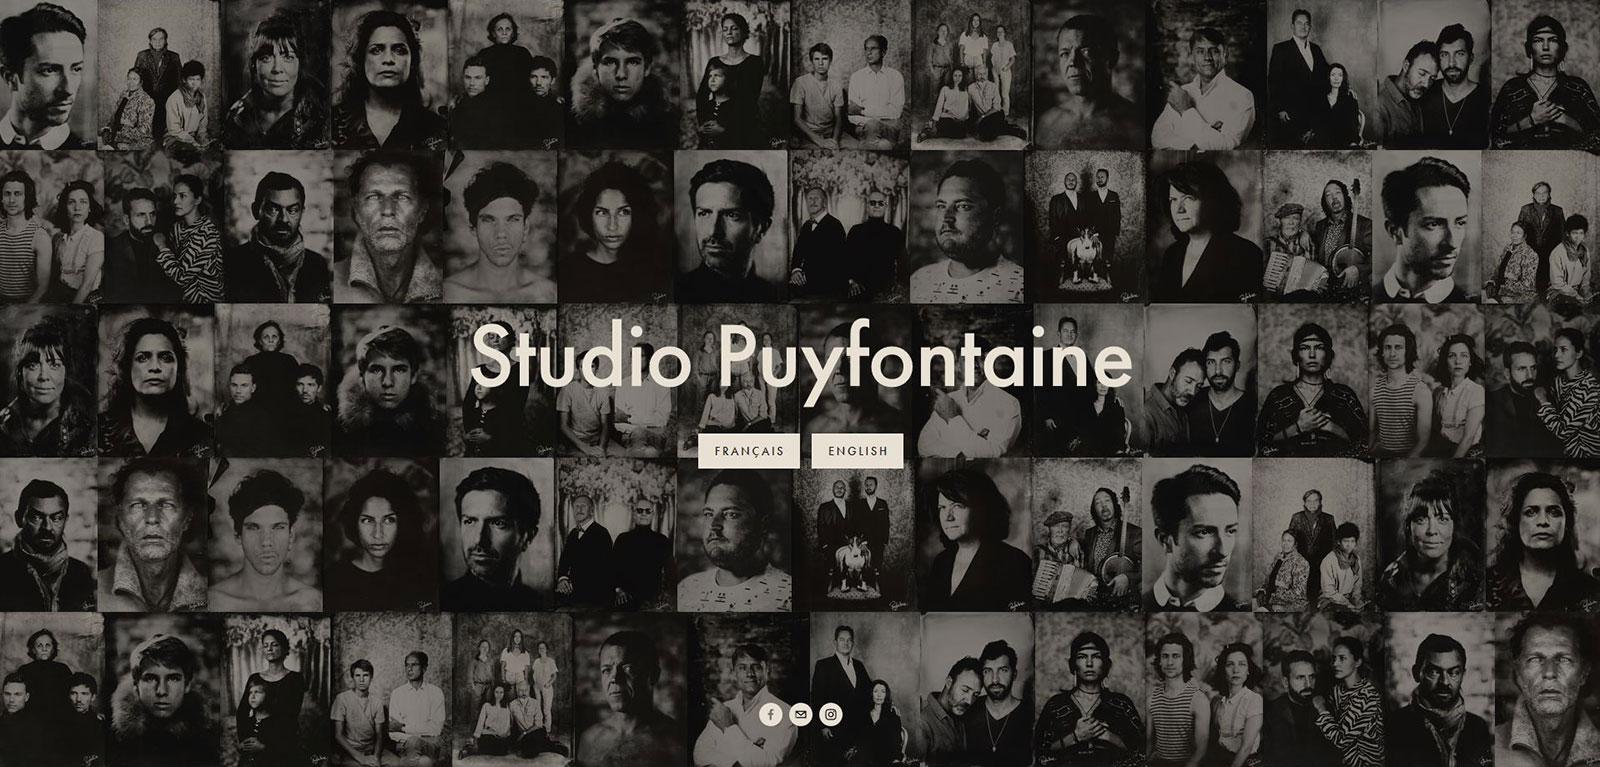 © Studio Puyfontaine